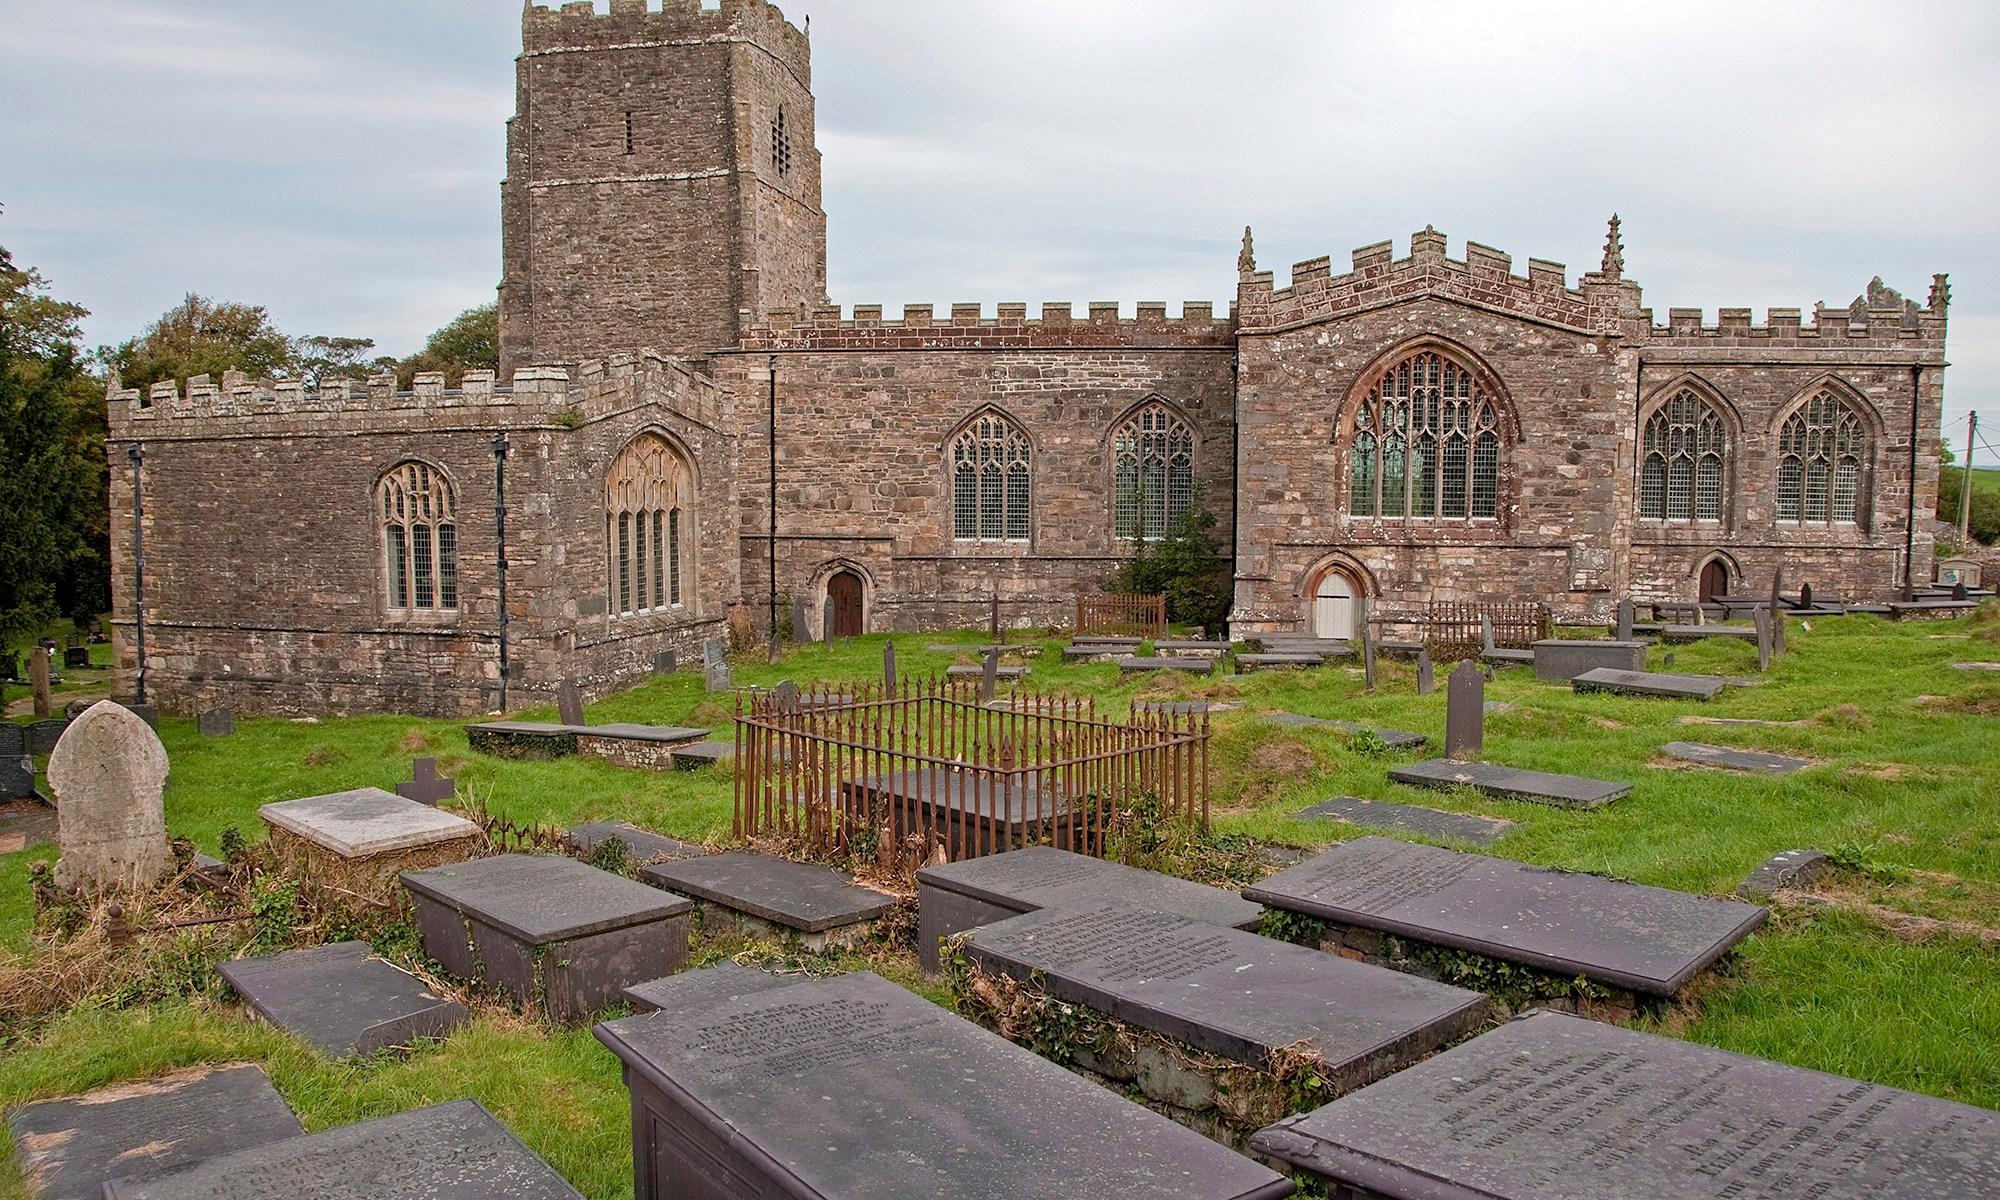 St. Beuno's Church, Penmorfa, Wales